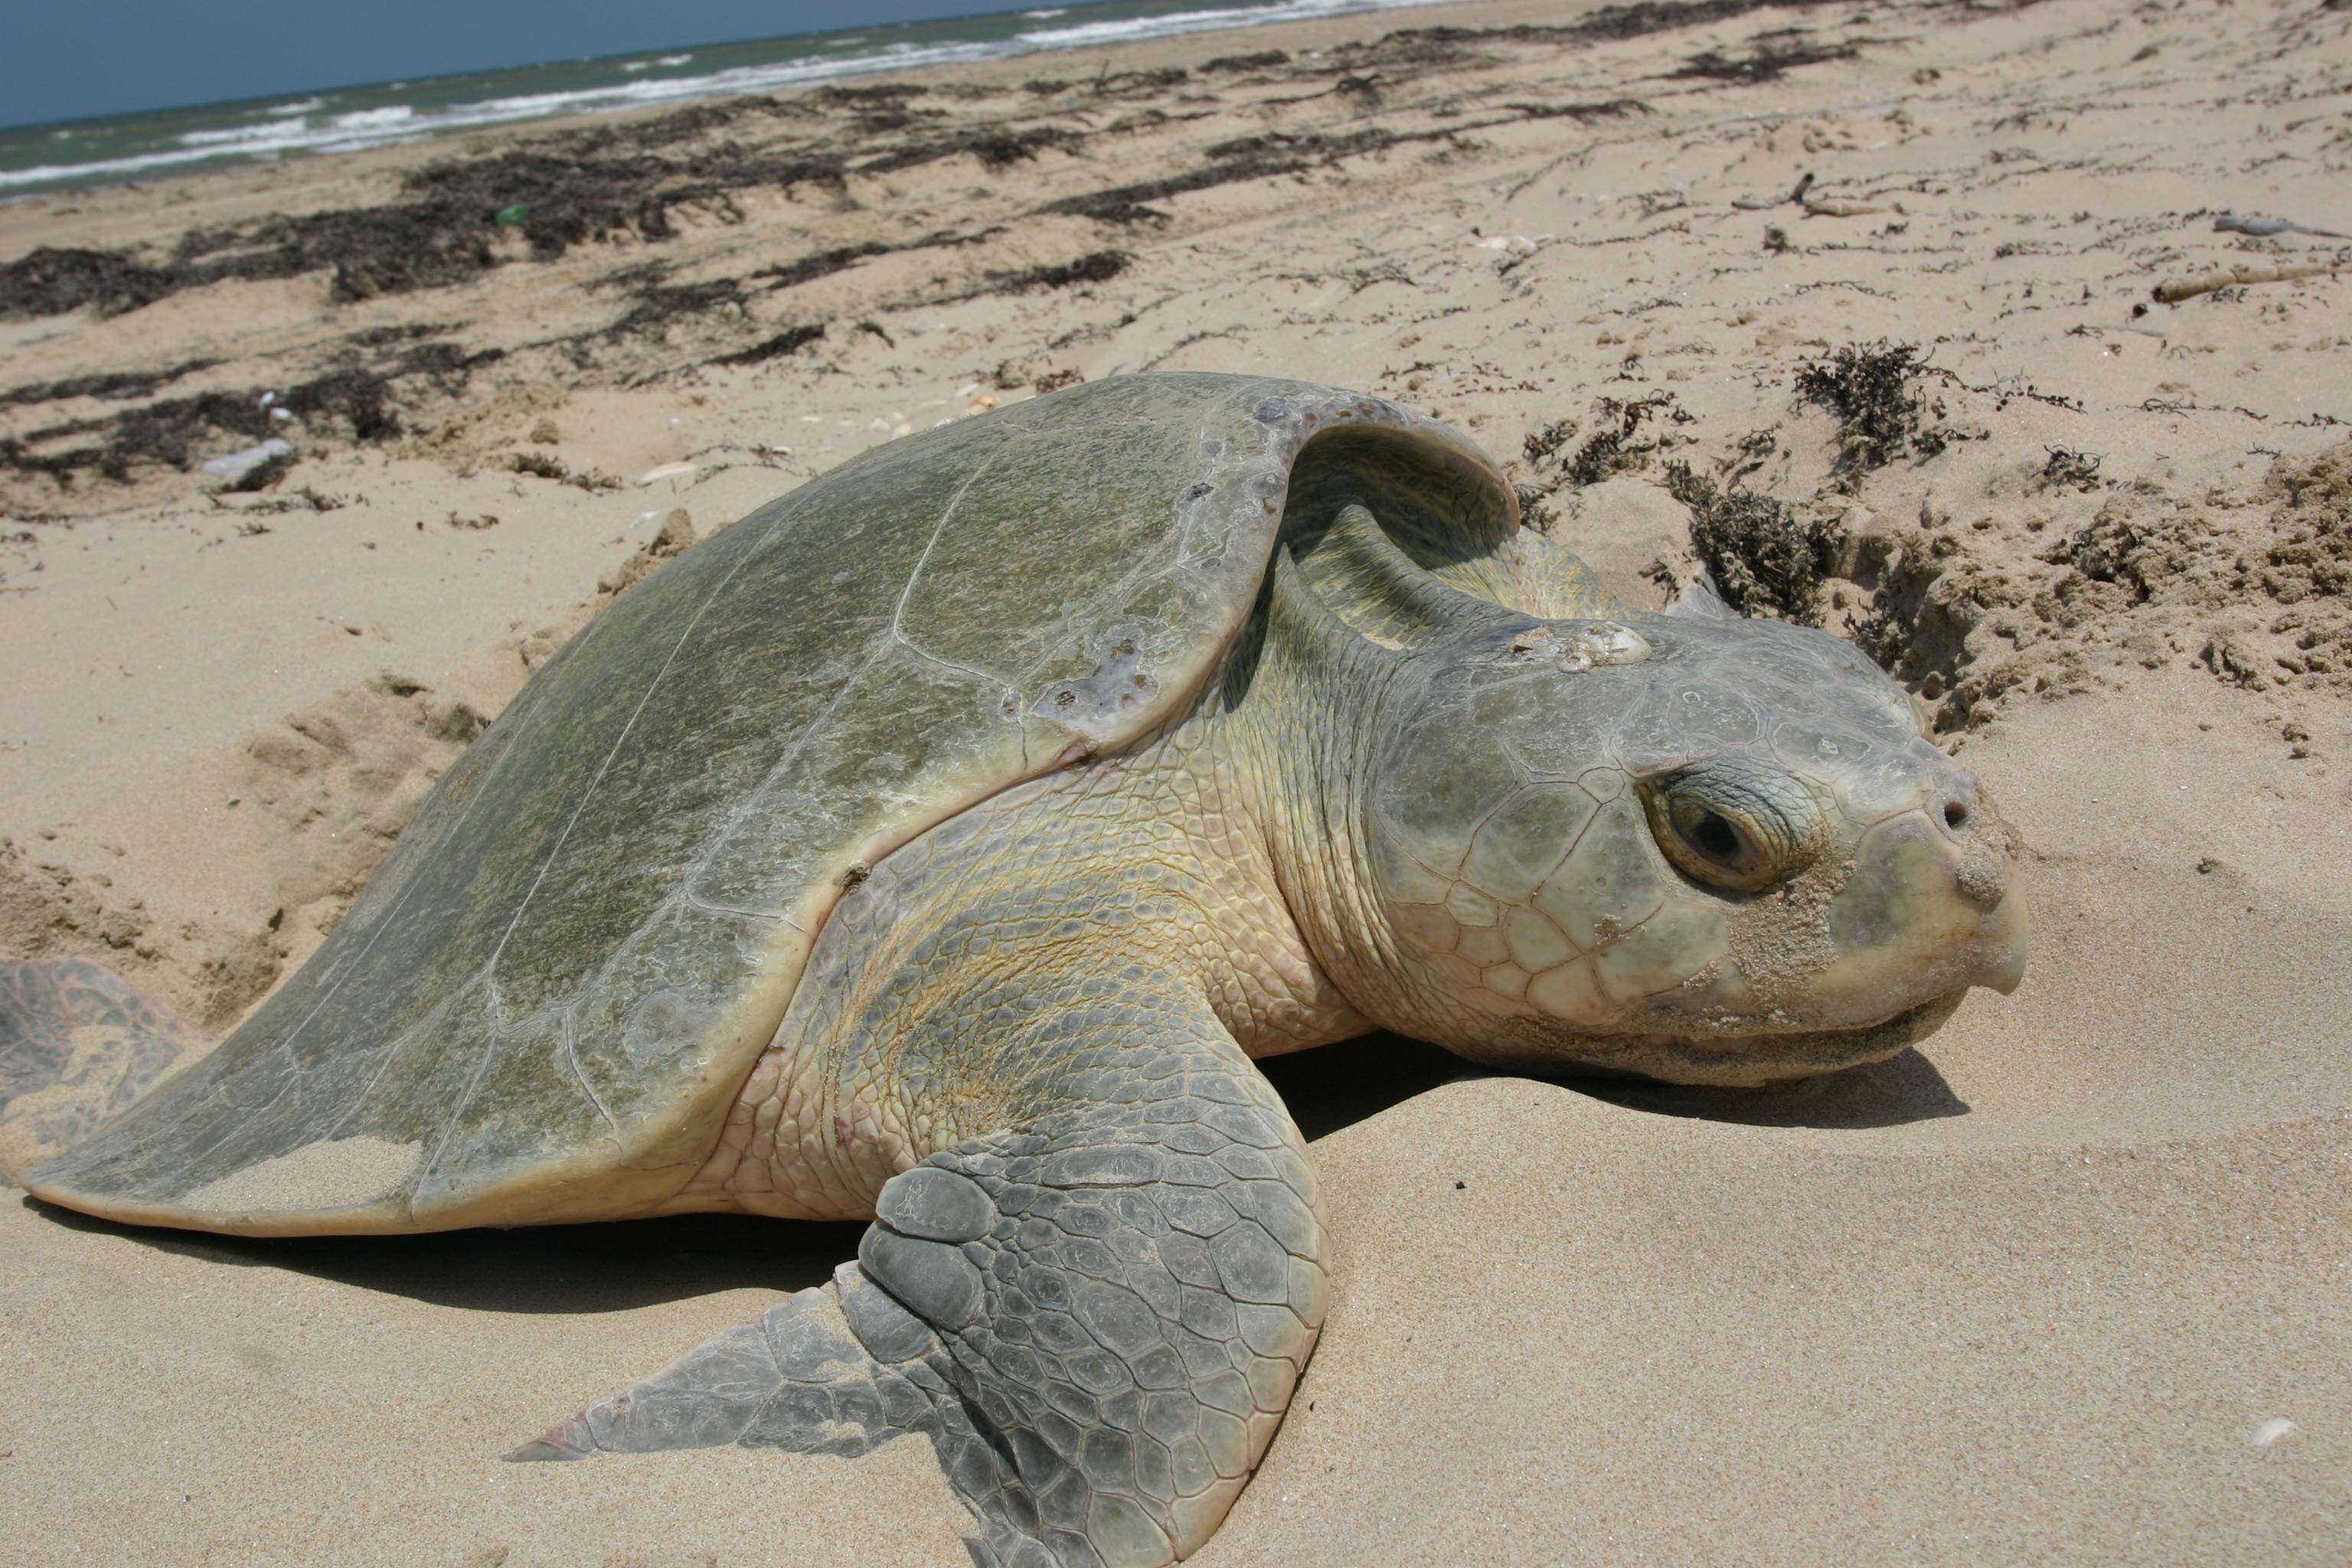 File:Kemp's Ridley sea turtle nesting.JPG - Wikimedia Commons